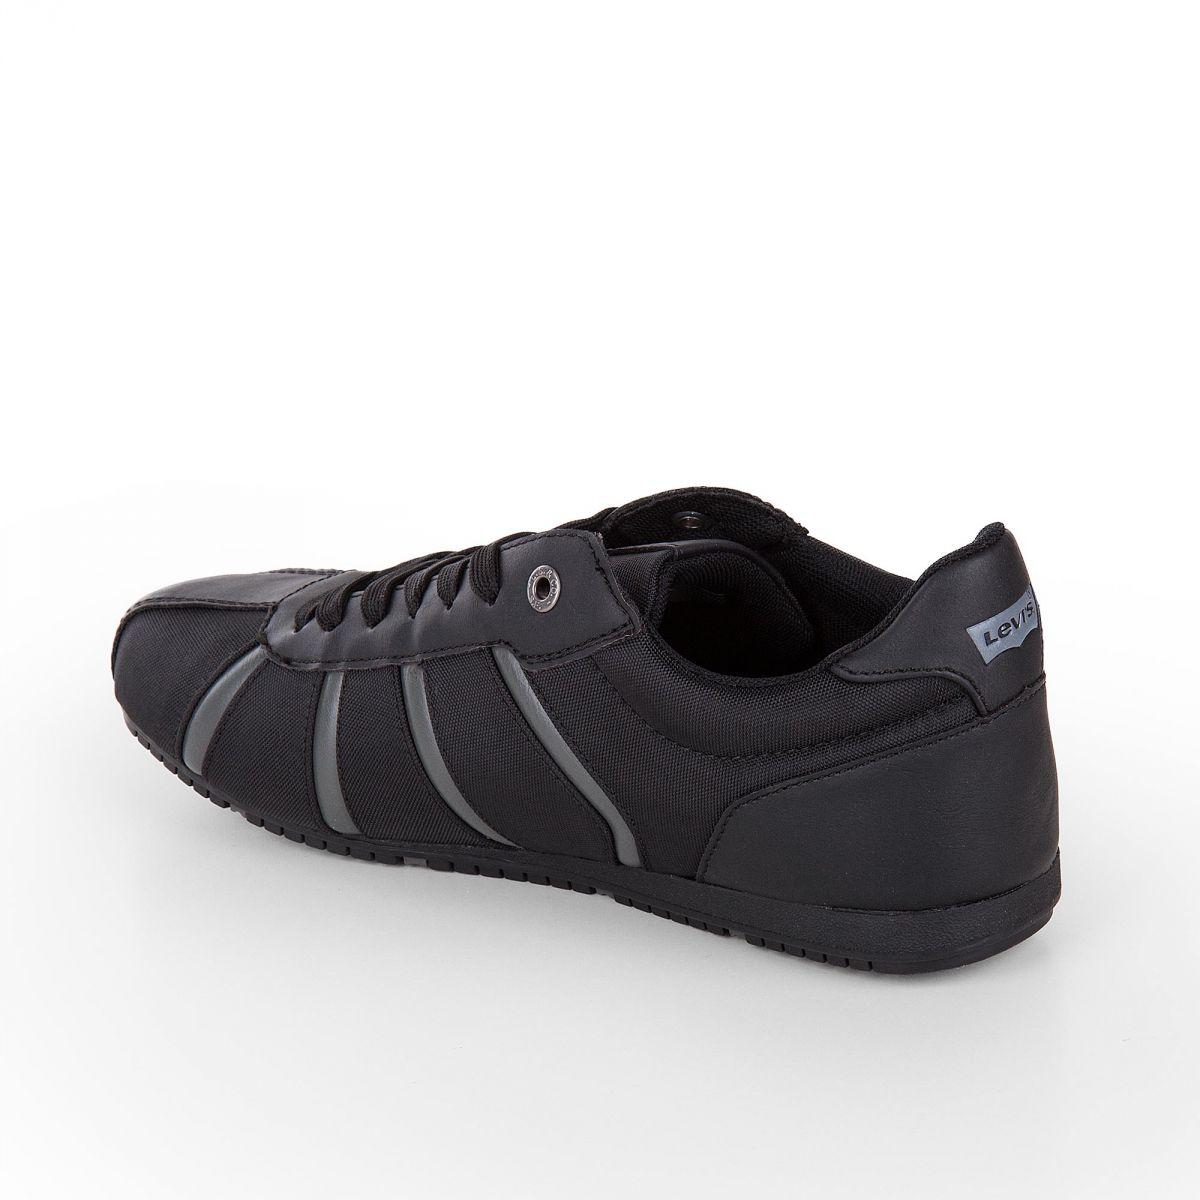 baskets sneakers noir homme levis prix d griff. Black Bedroom Furniture Sets. Home Design Ideas